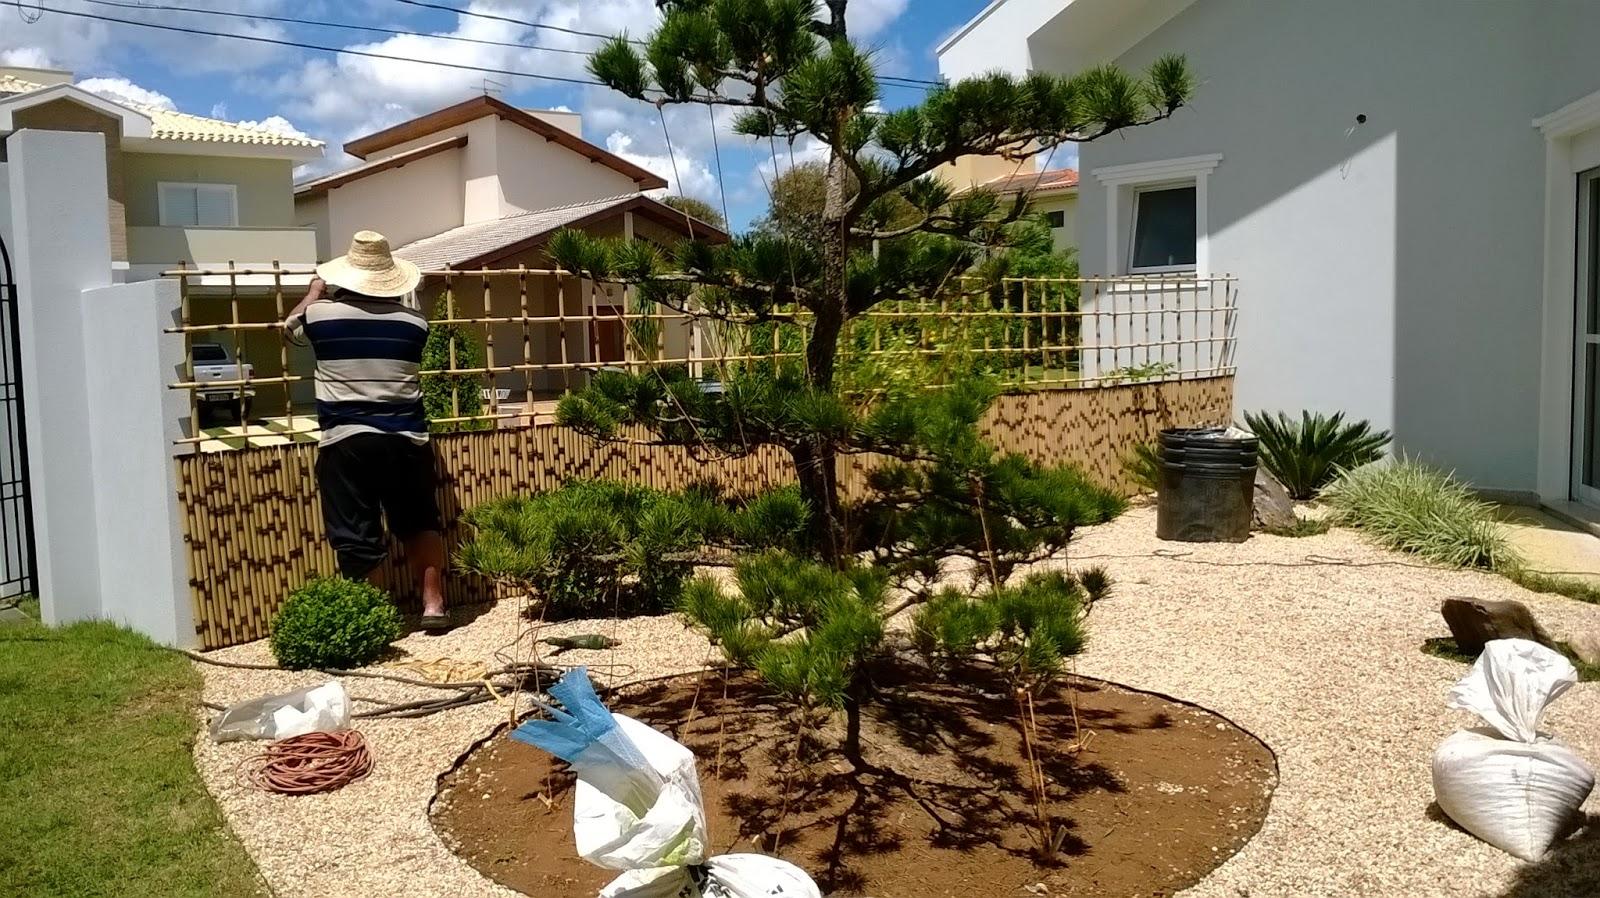 manutenção de jardim, poda pinheiro negro, kuromatsu, jardim japones